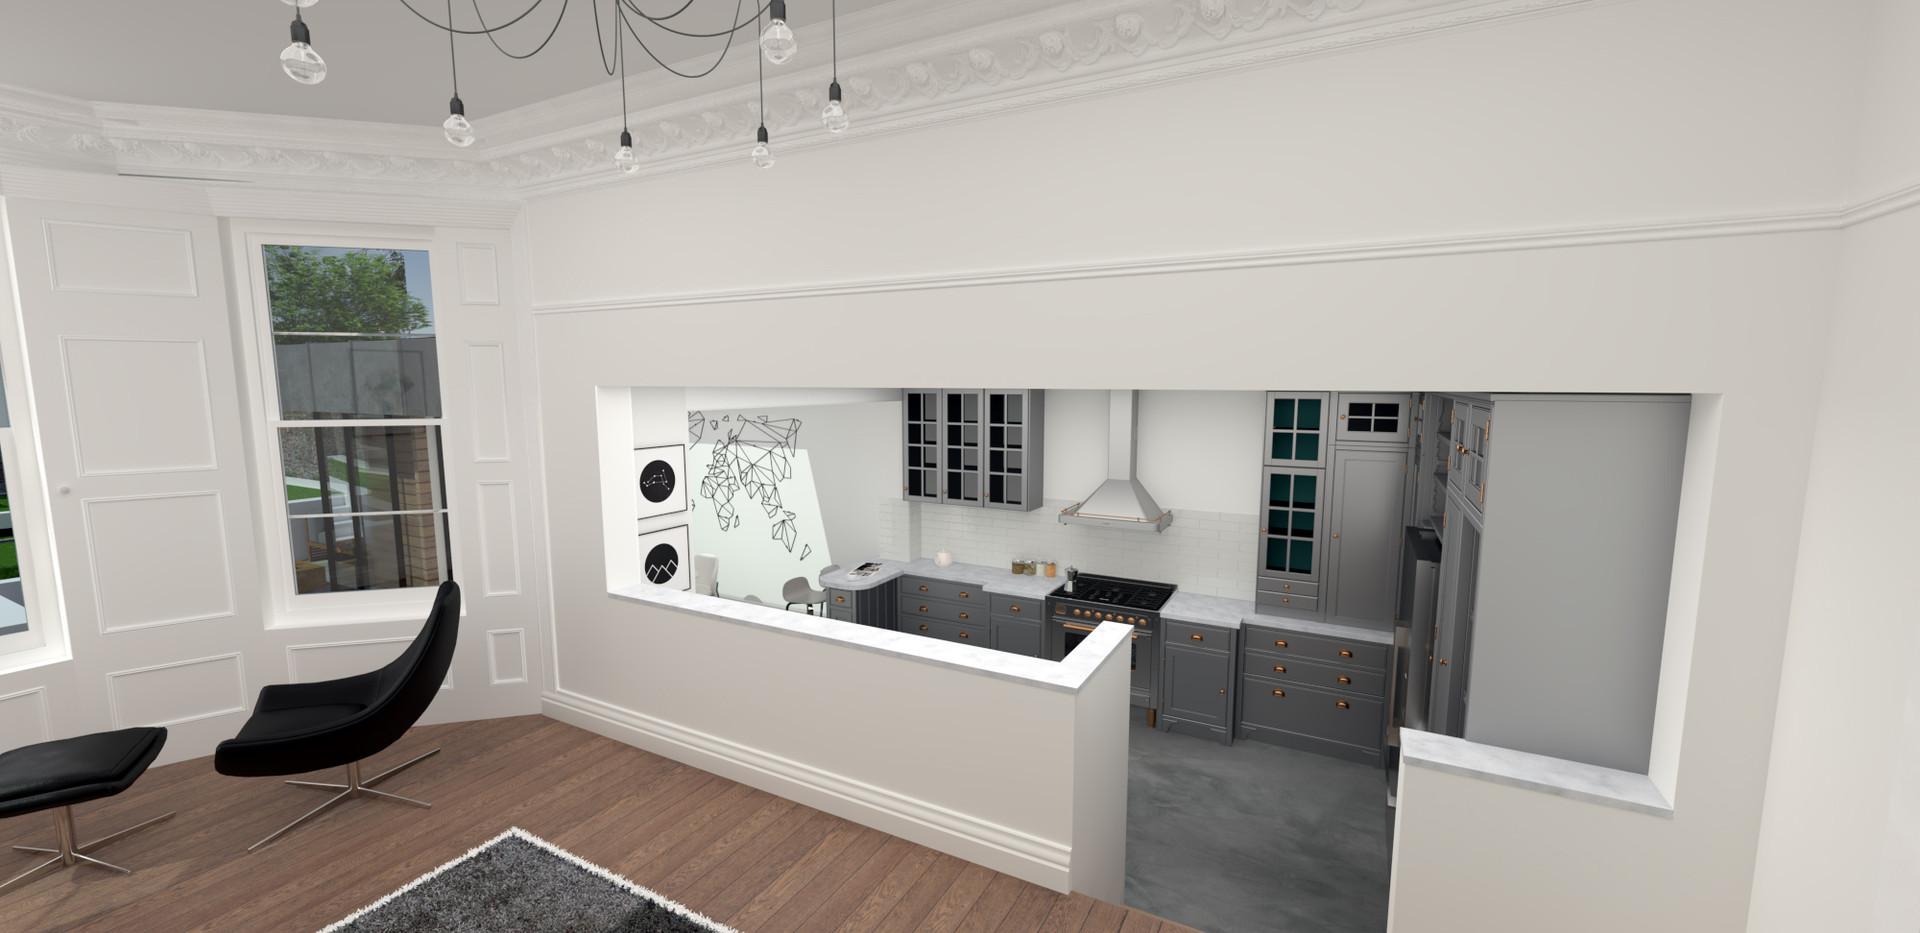 V_4_Lounge_To_Kitchen_Polished_Concrete.